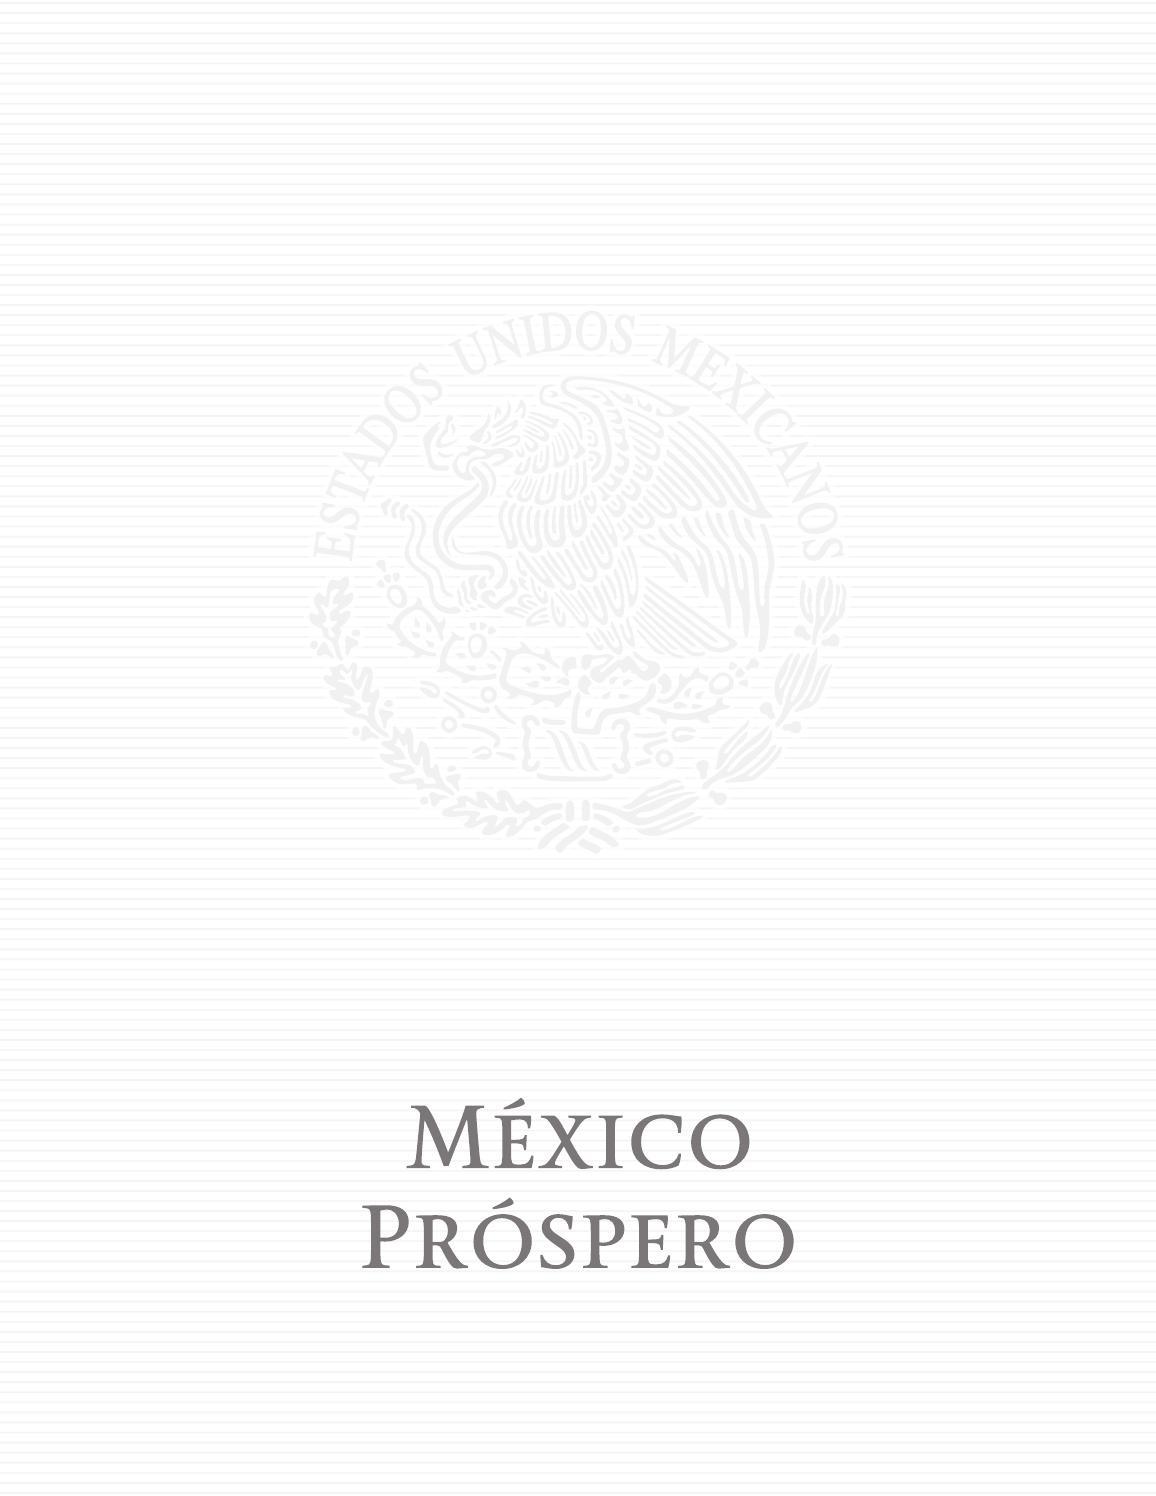 Segundo Informe de Gobierno EPN parte 2 by Jorge Herrera Delgado - issuu